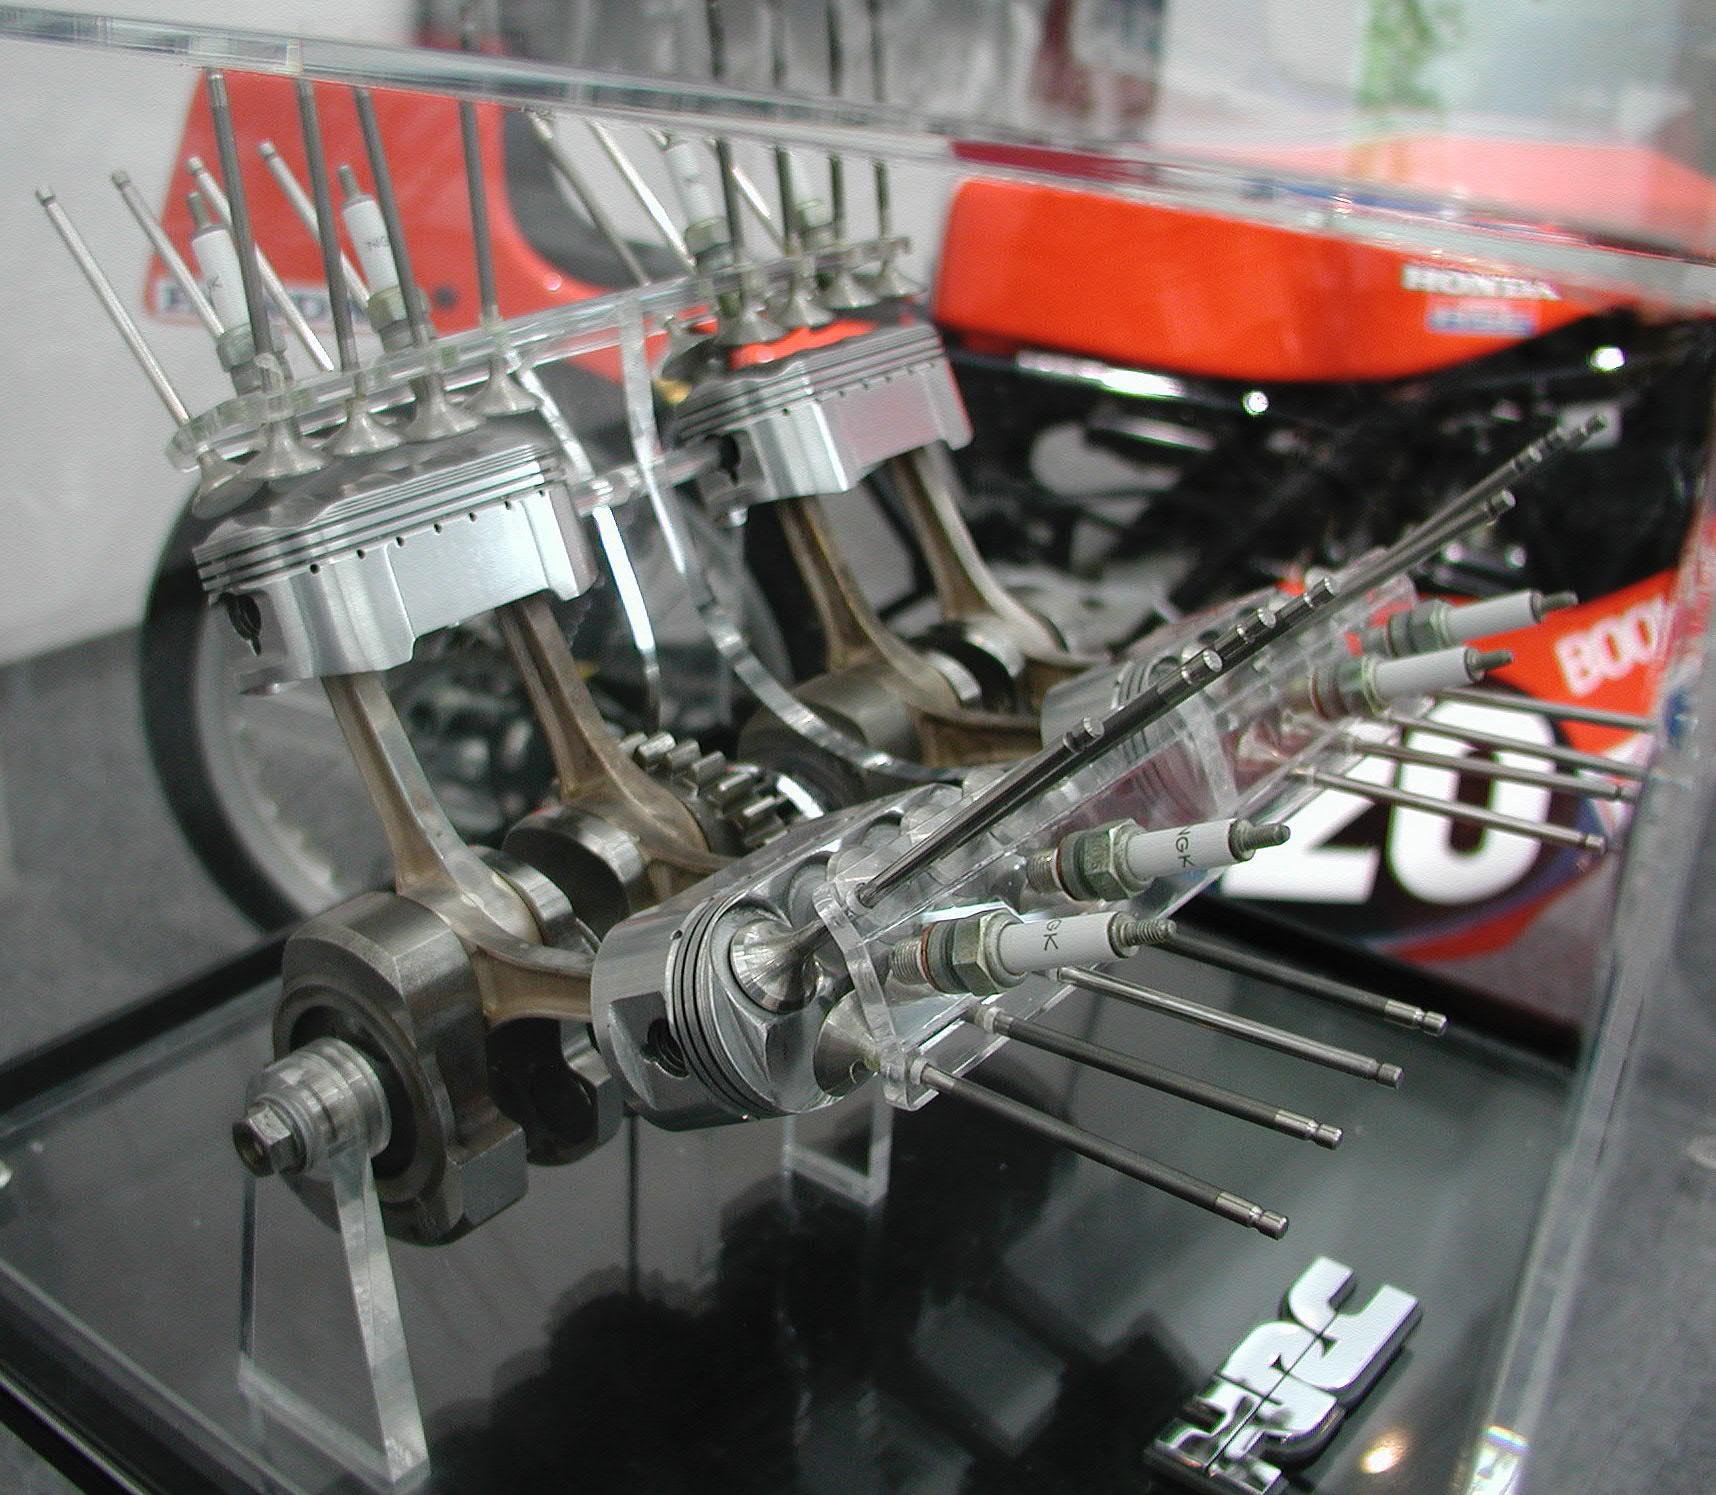 piston in car engine - photo #42